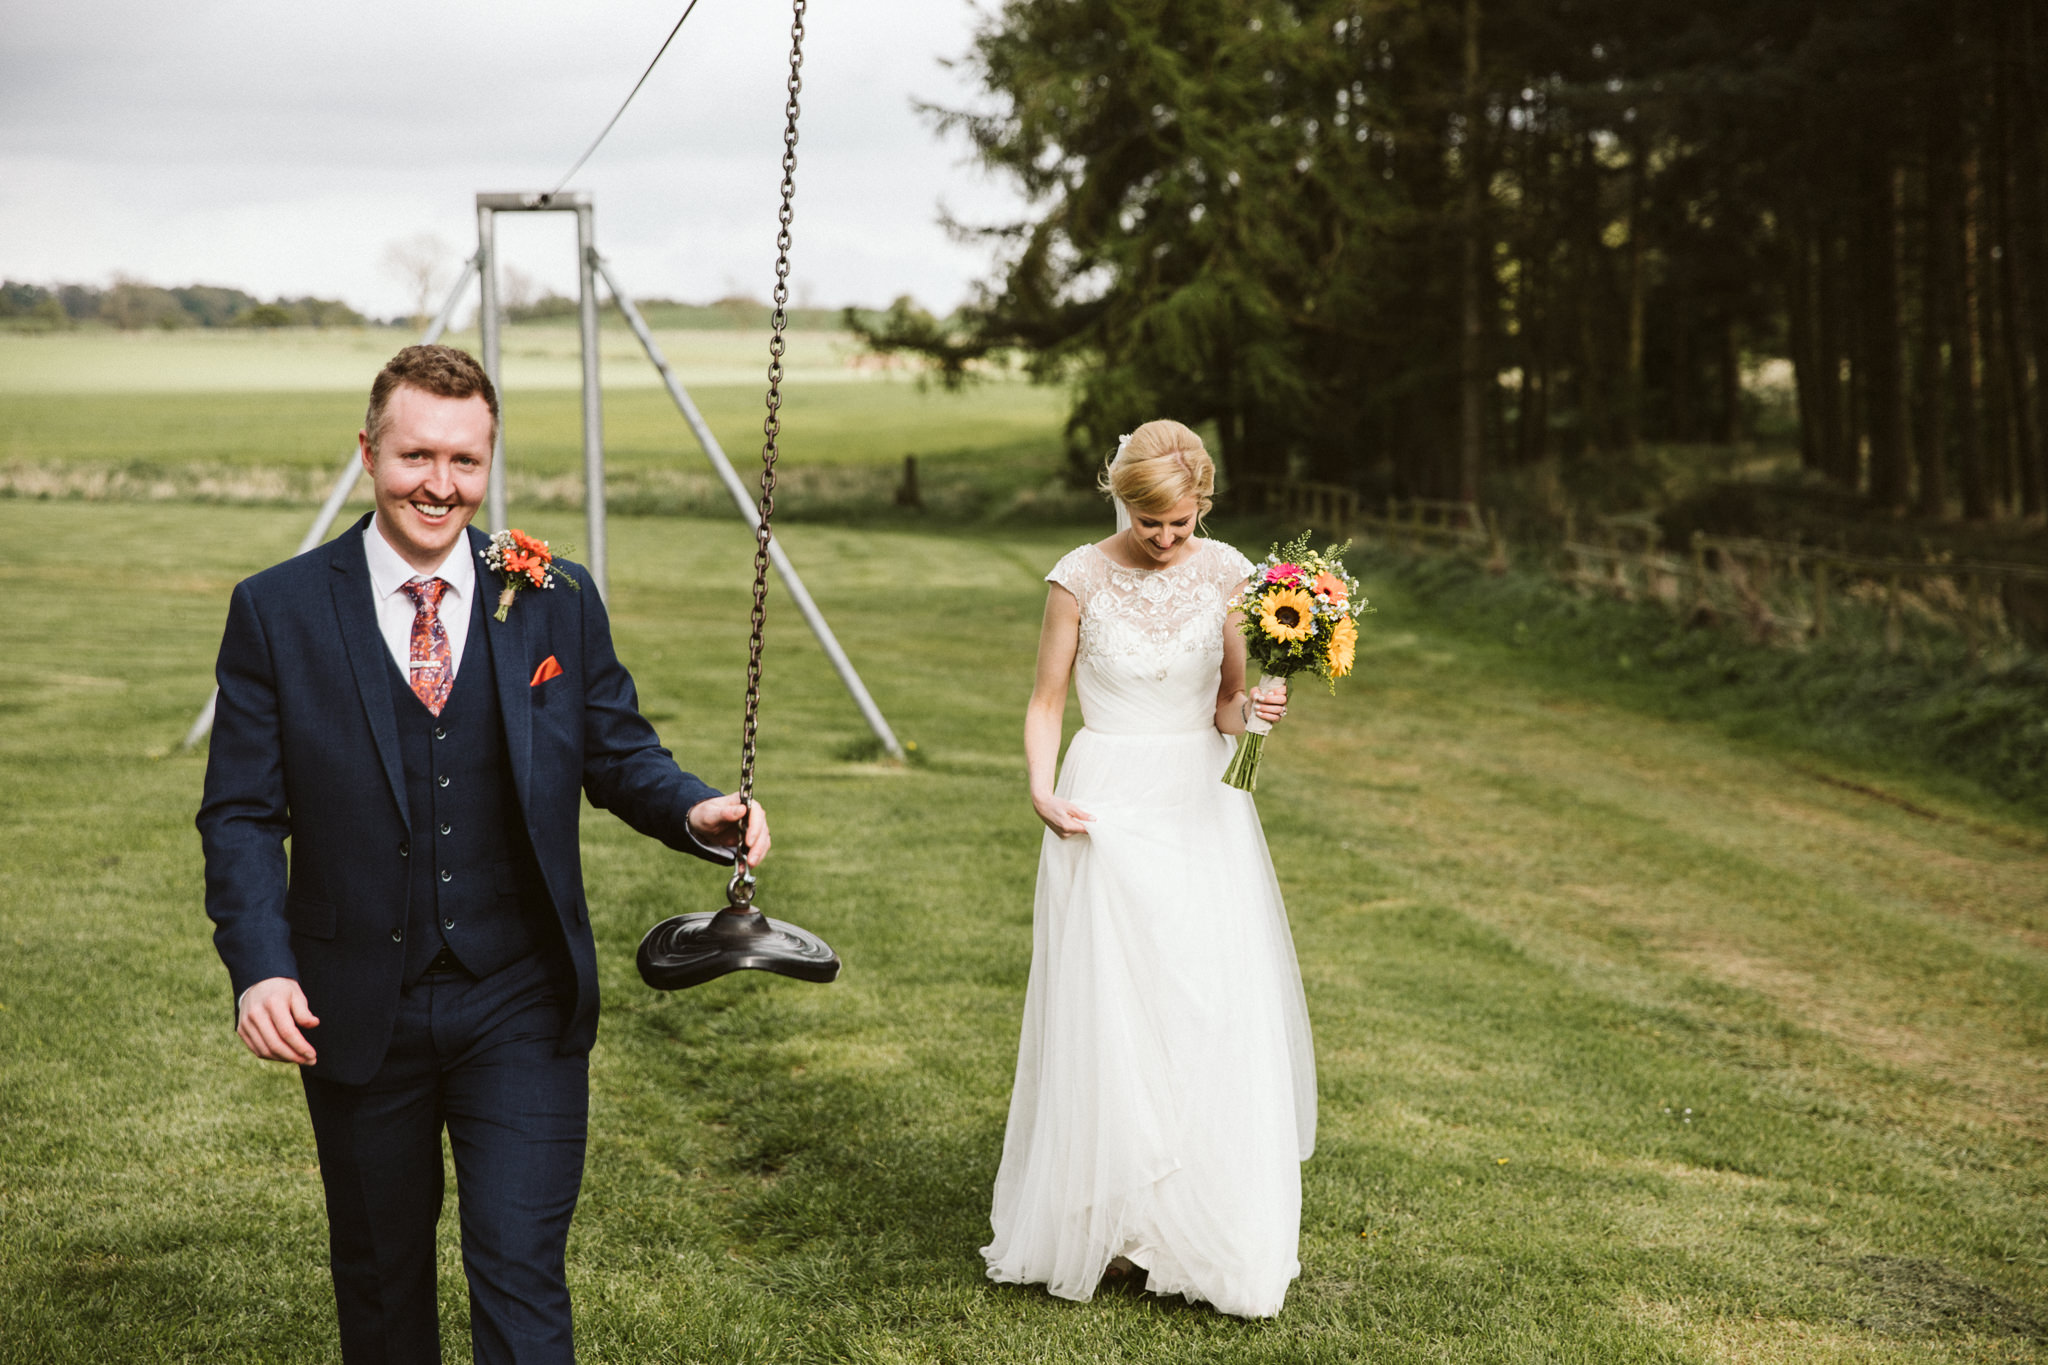 northside-farm-wedding-northumberland-margarita-hope (92).jpg